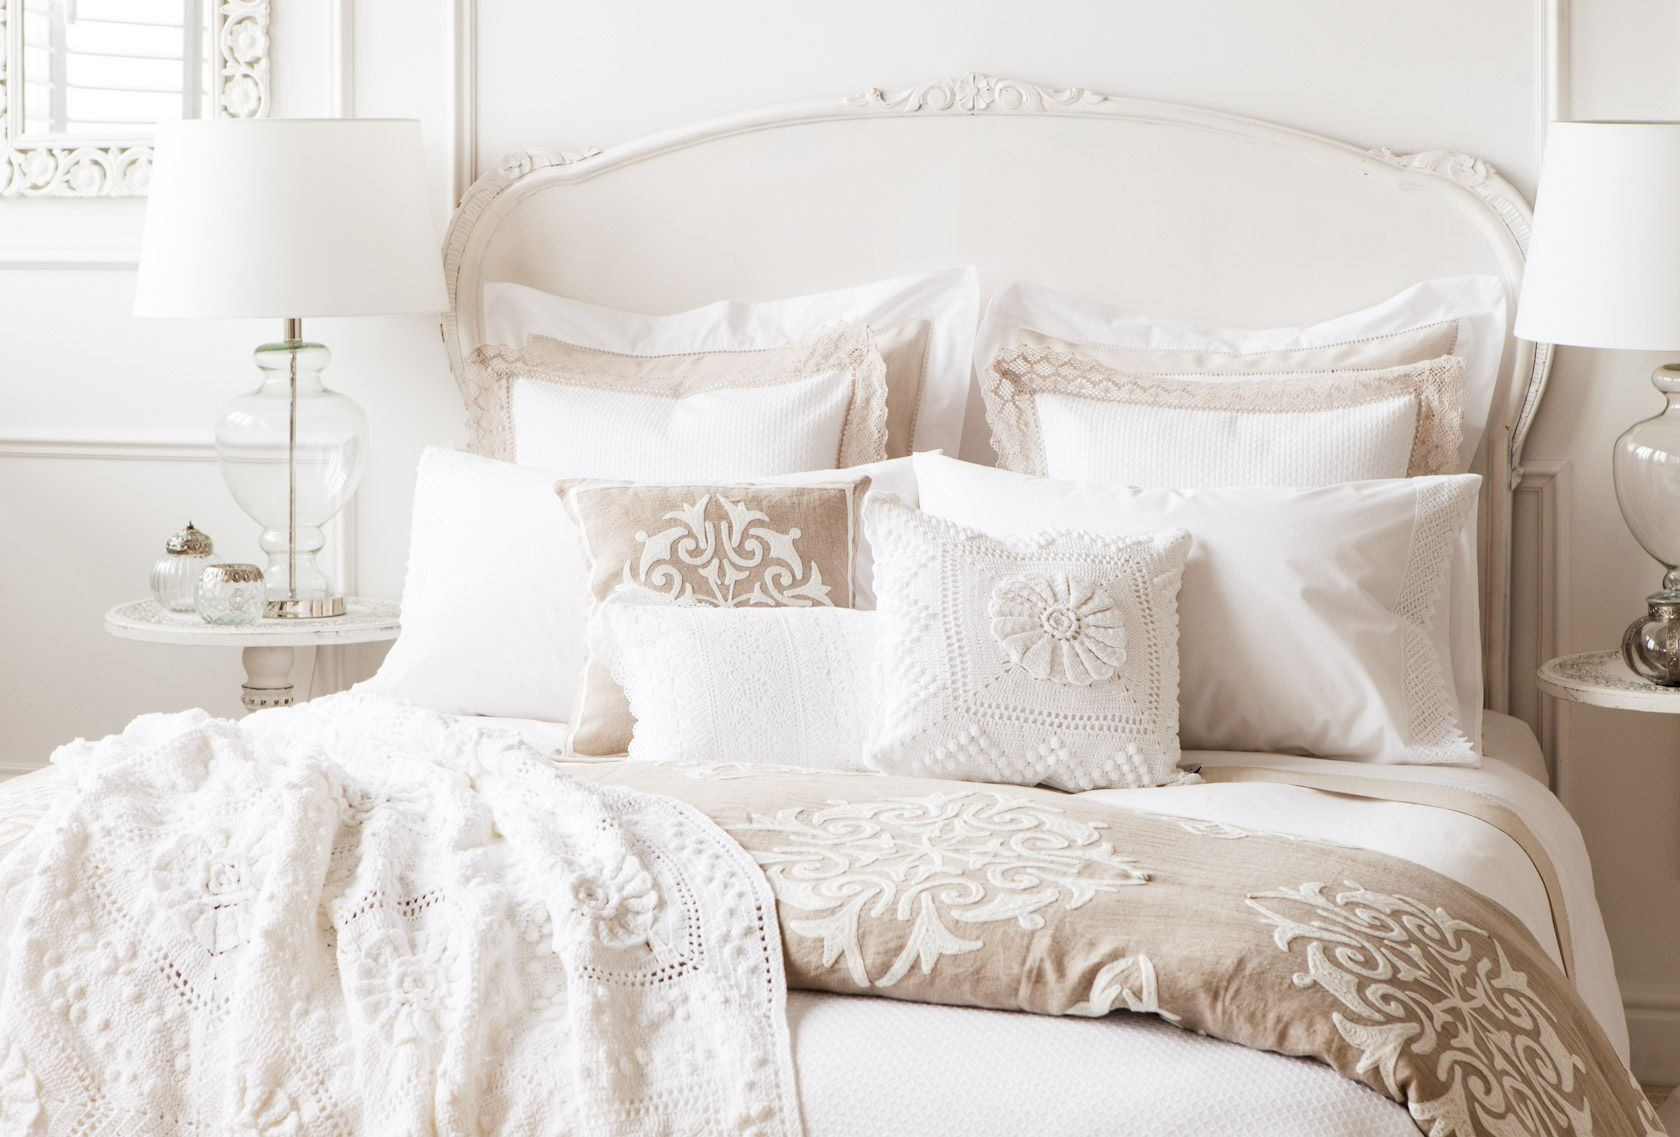 Subhome Page - Zara Home  Zara home bedroom, Small room bedroom